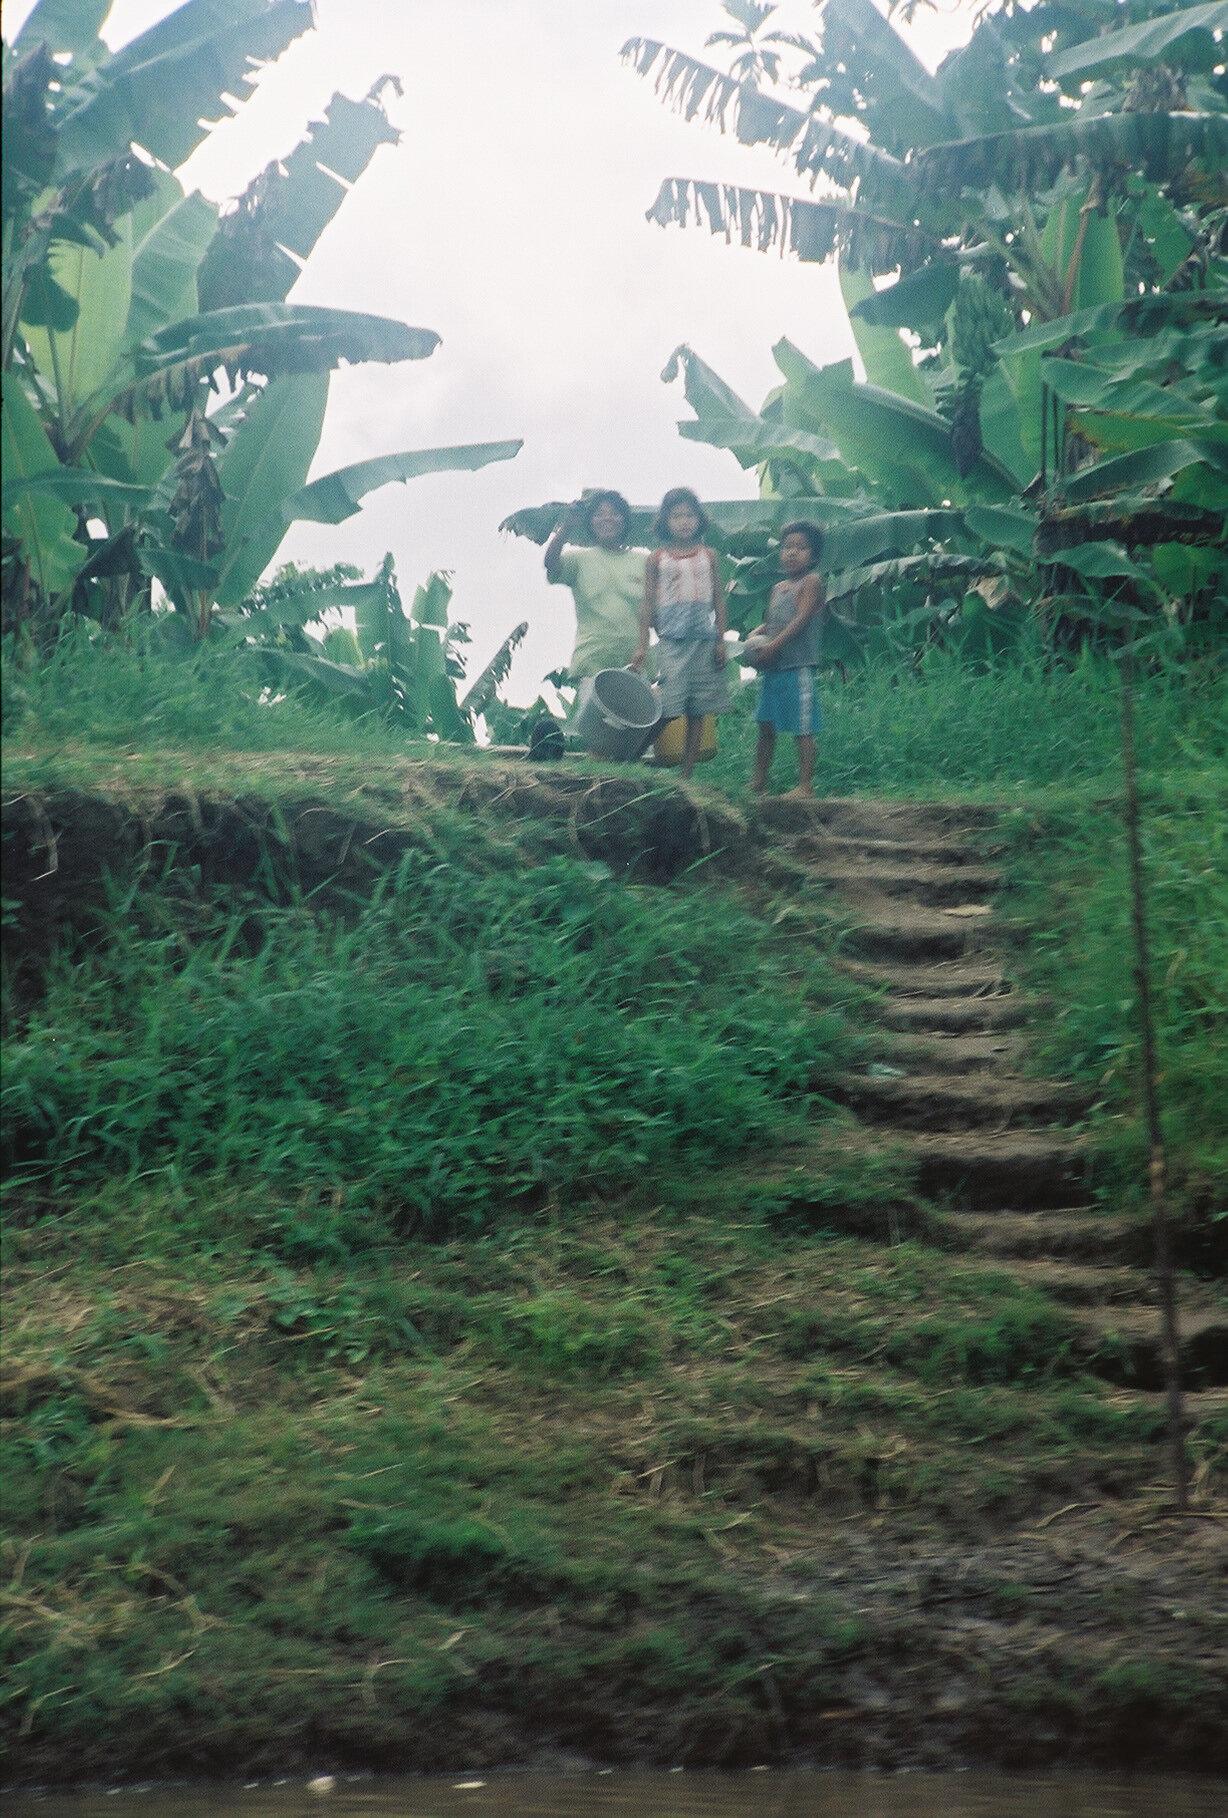 scenery9.jpg